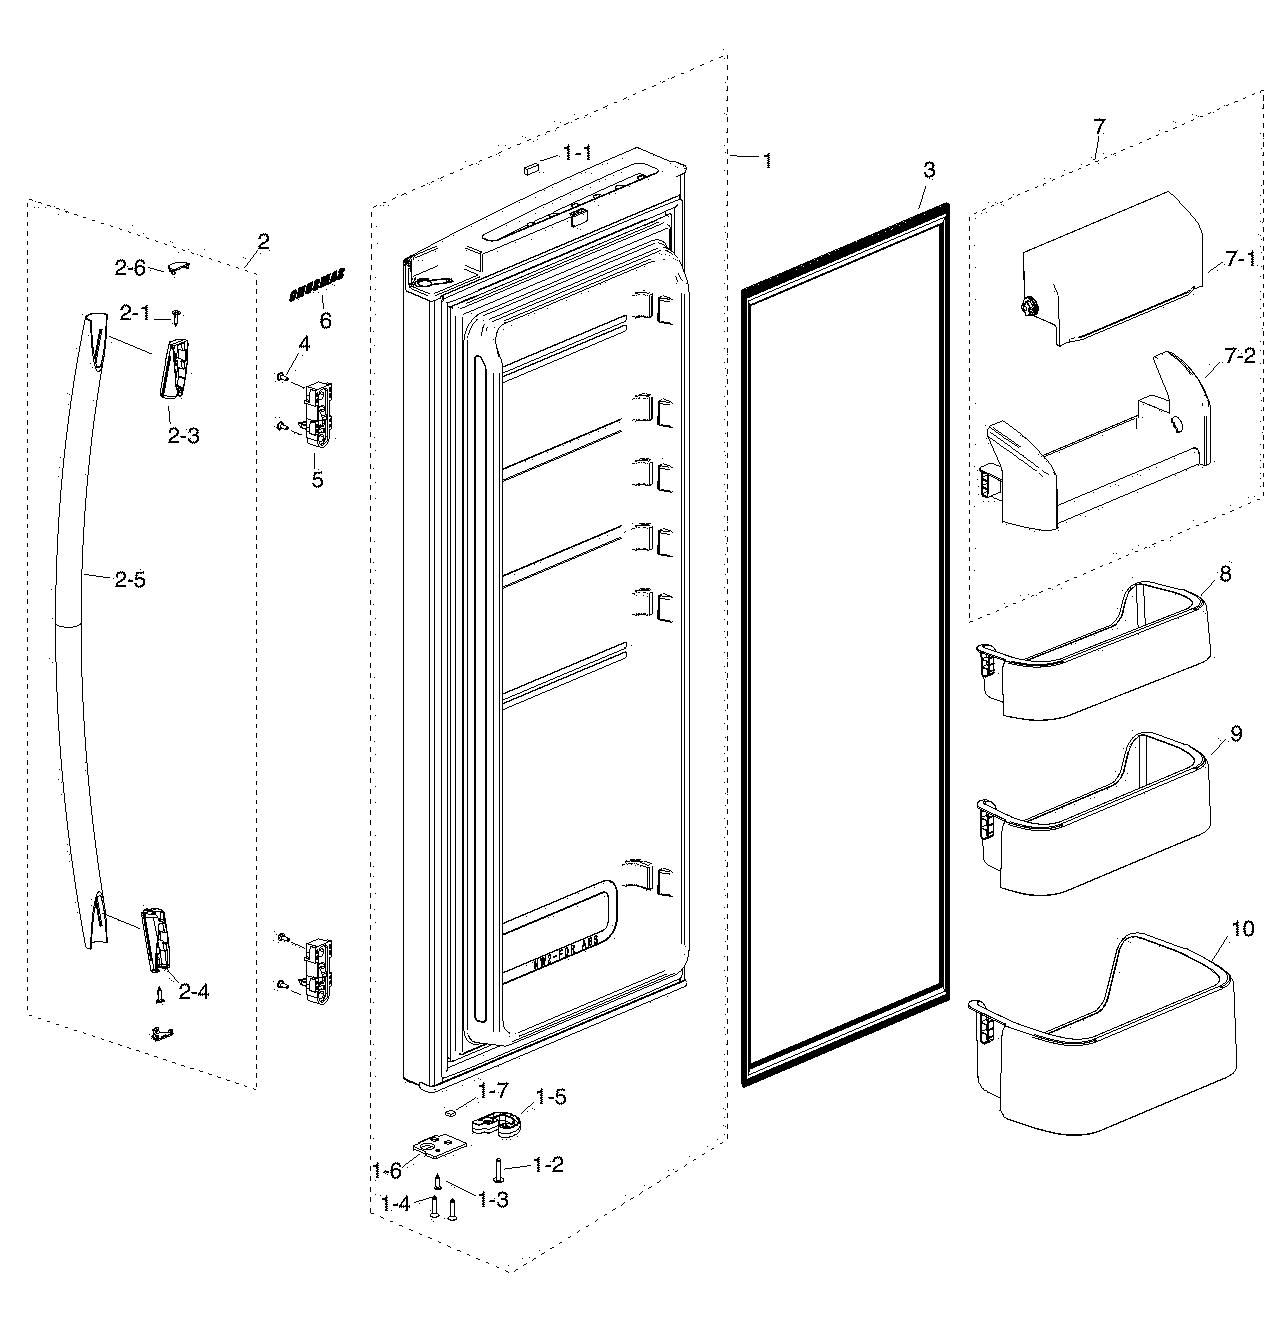 For My Samsung Refrigerator Schematic Rf217acbp Wiring Diagram